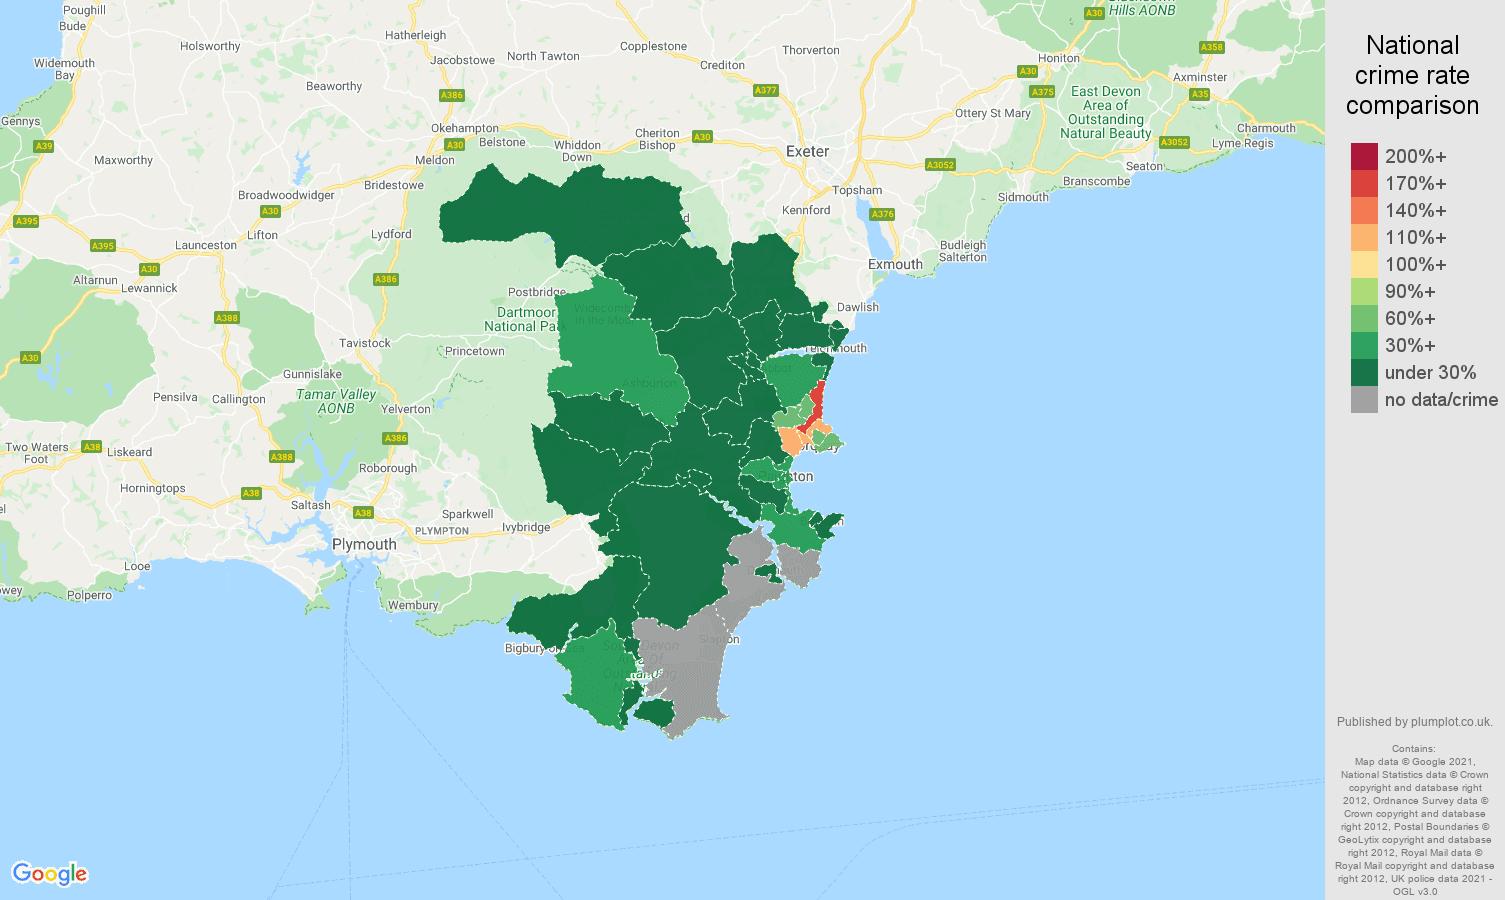 Torquay vehicle crime rate comparison map